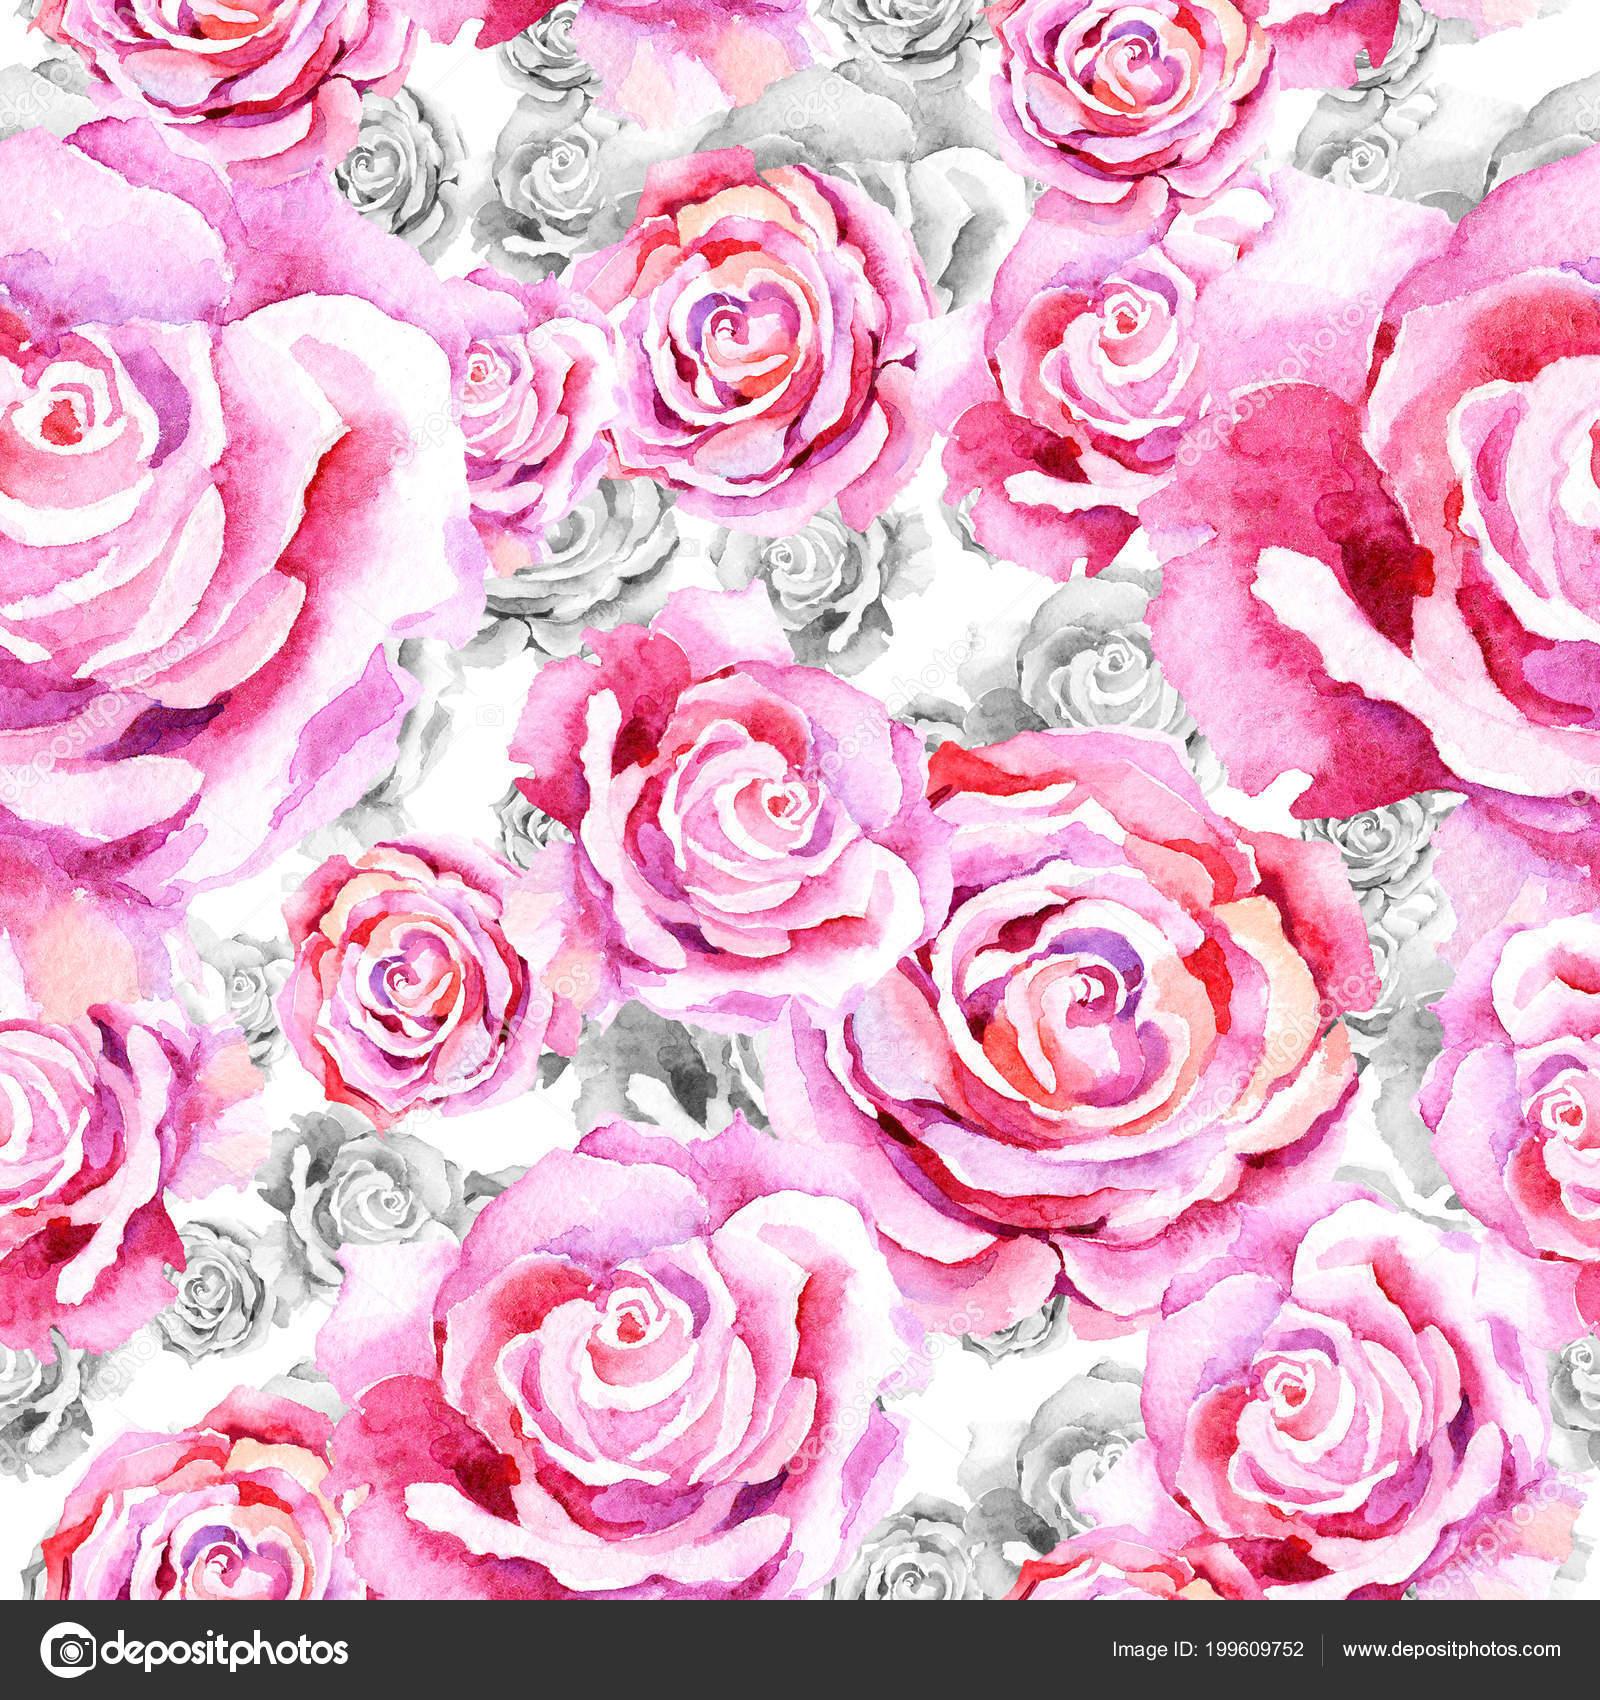 Delicate Pink Rose Floral Botanical Flower Seamless Background